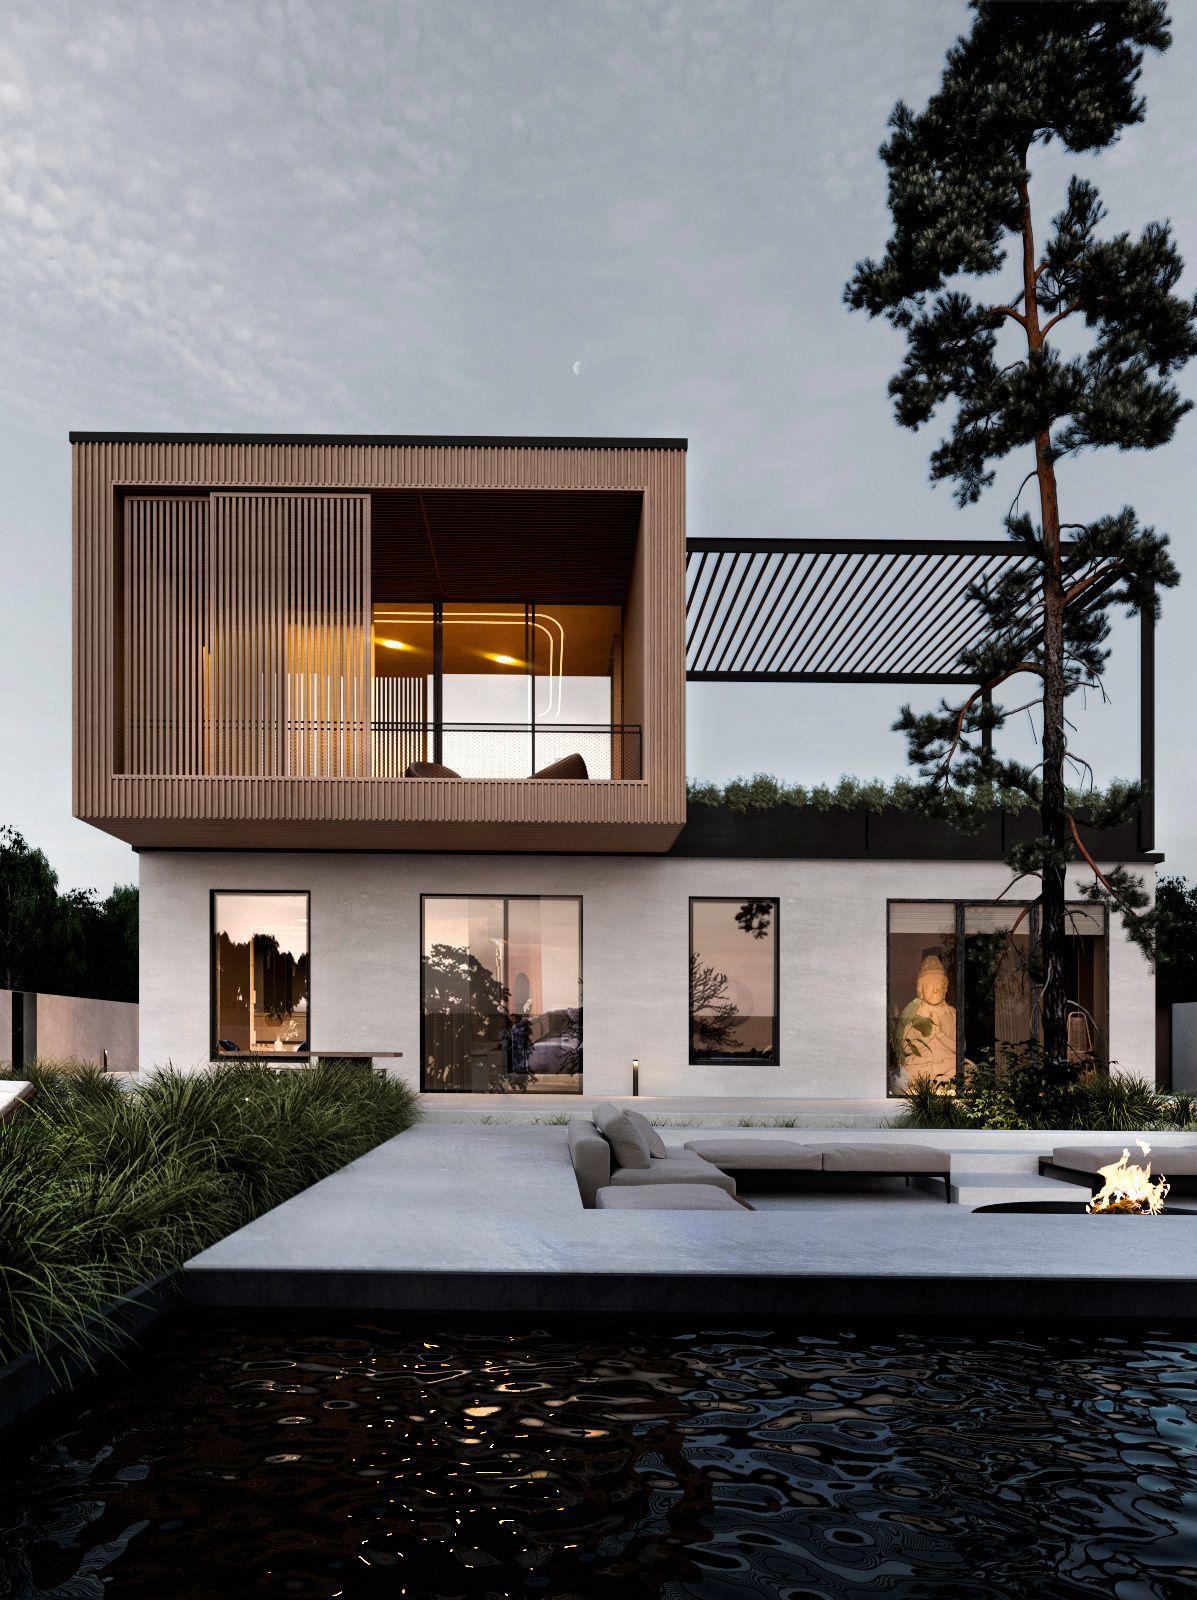 49 Most Popular Modern Dream House Exterior Design Ideas 3 In 2020: Modern Villa Design, Modern House Exterior, Facade